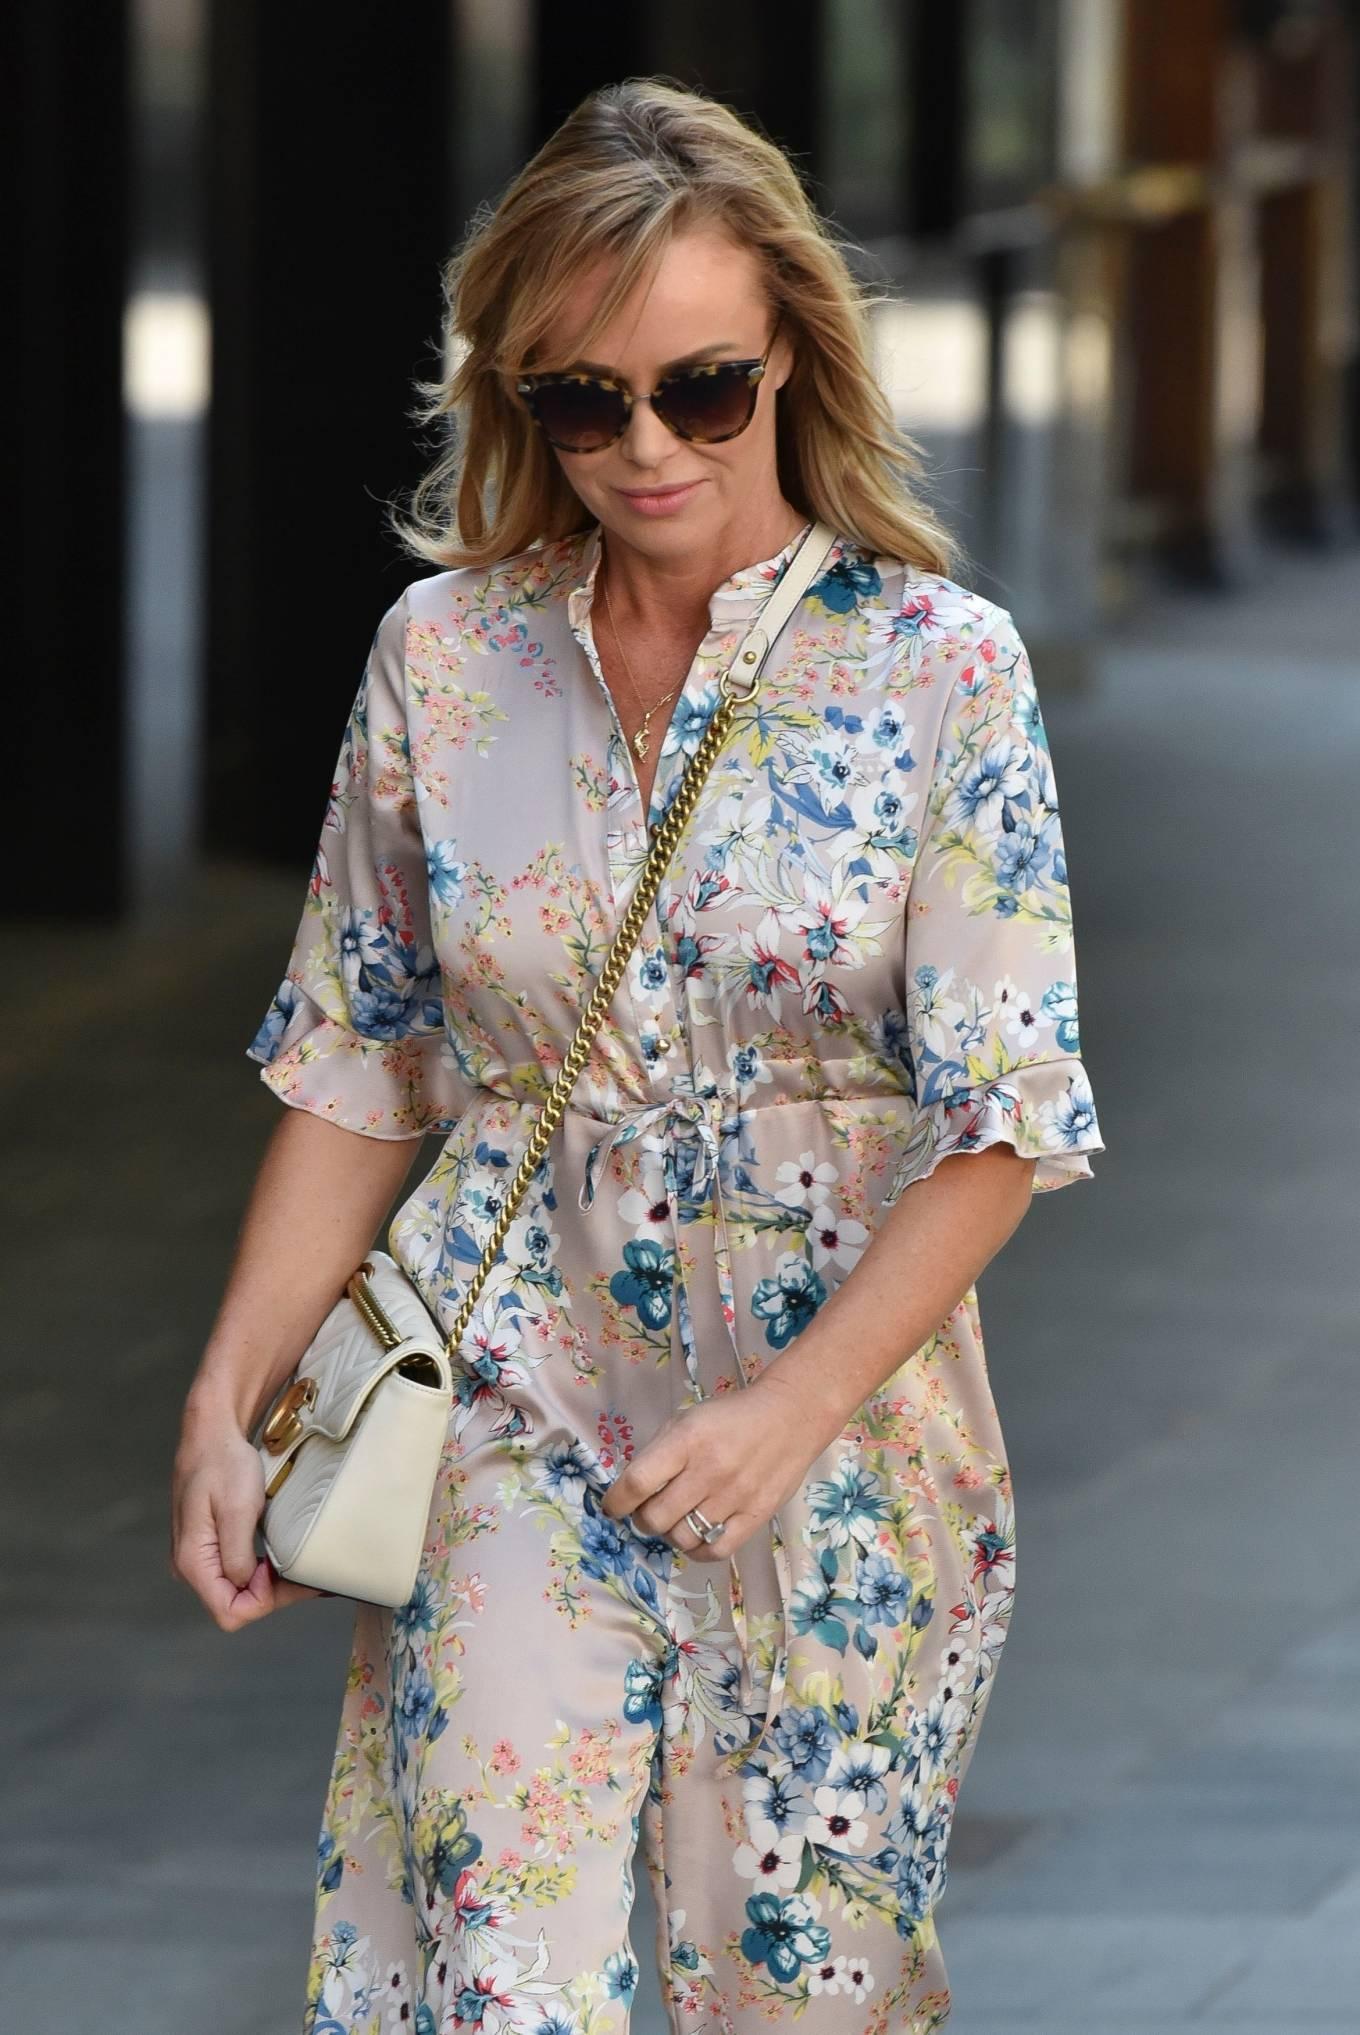 Amanda Holden 2020 : Amanda Holden – Spotted in floral jumpsuit at Global Radio Studios-06